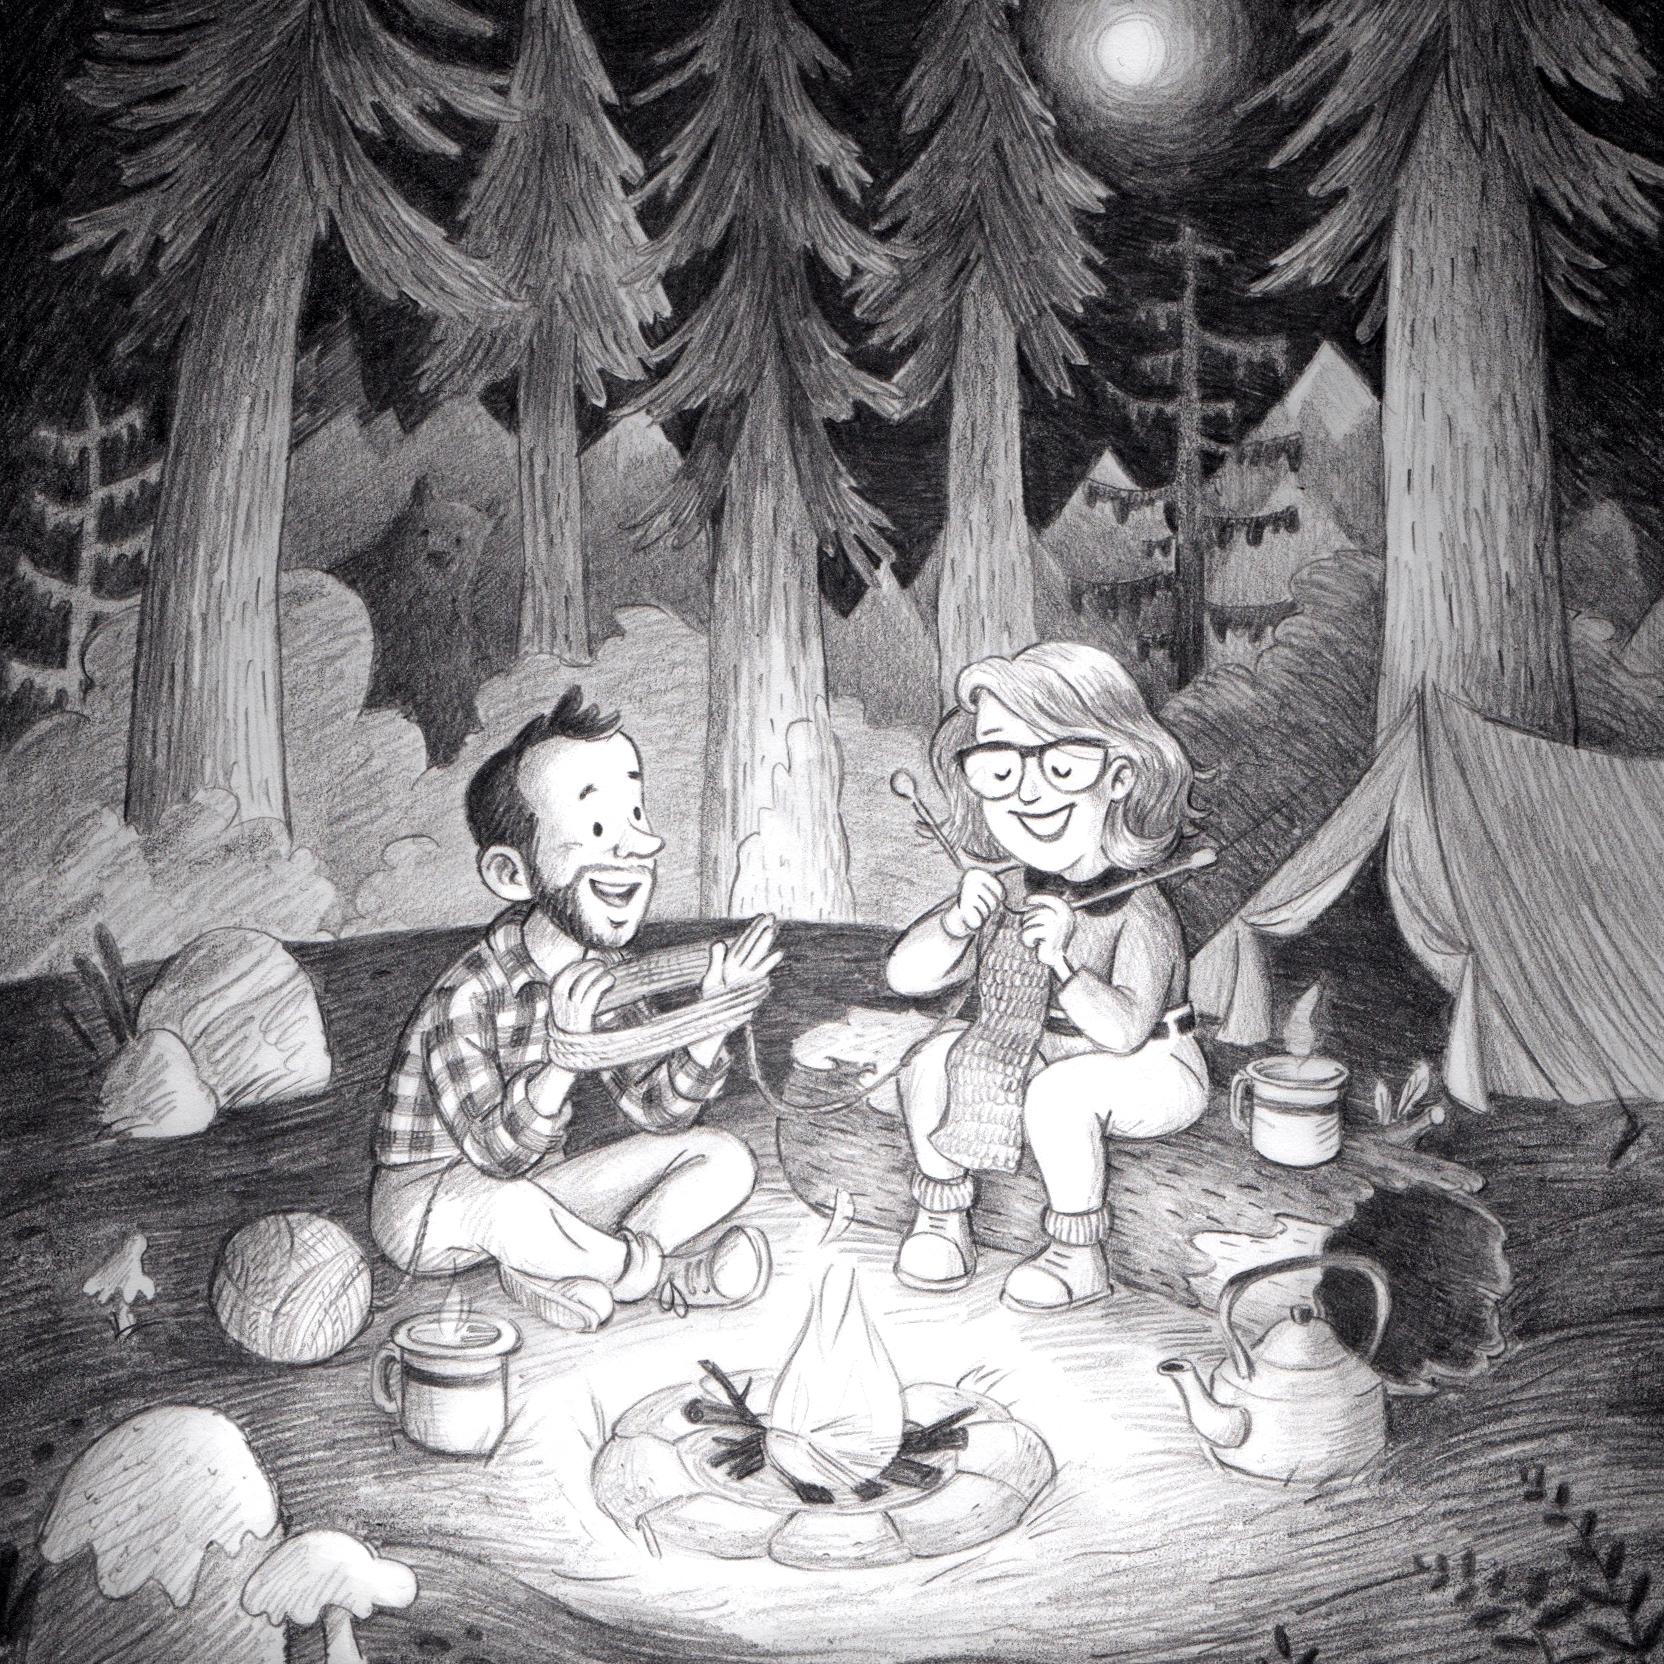 Goodbye drawing for Maarten & Linde